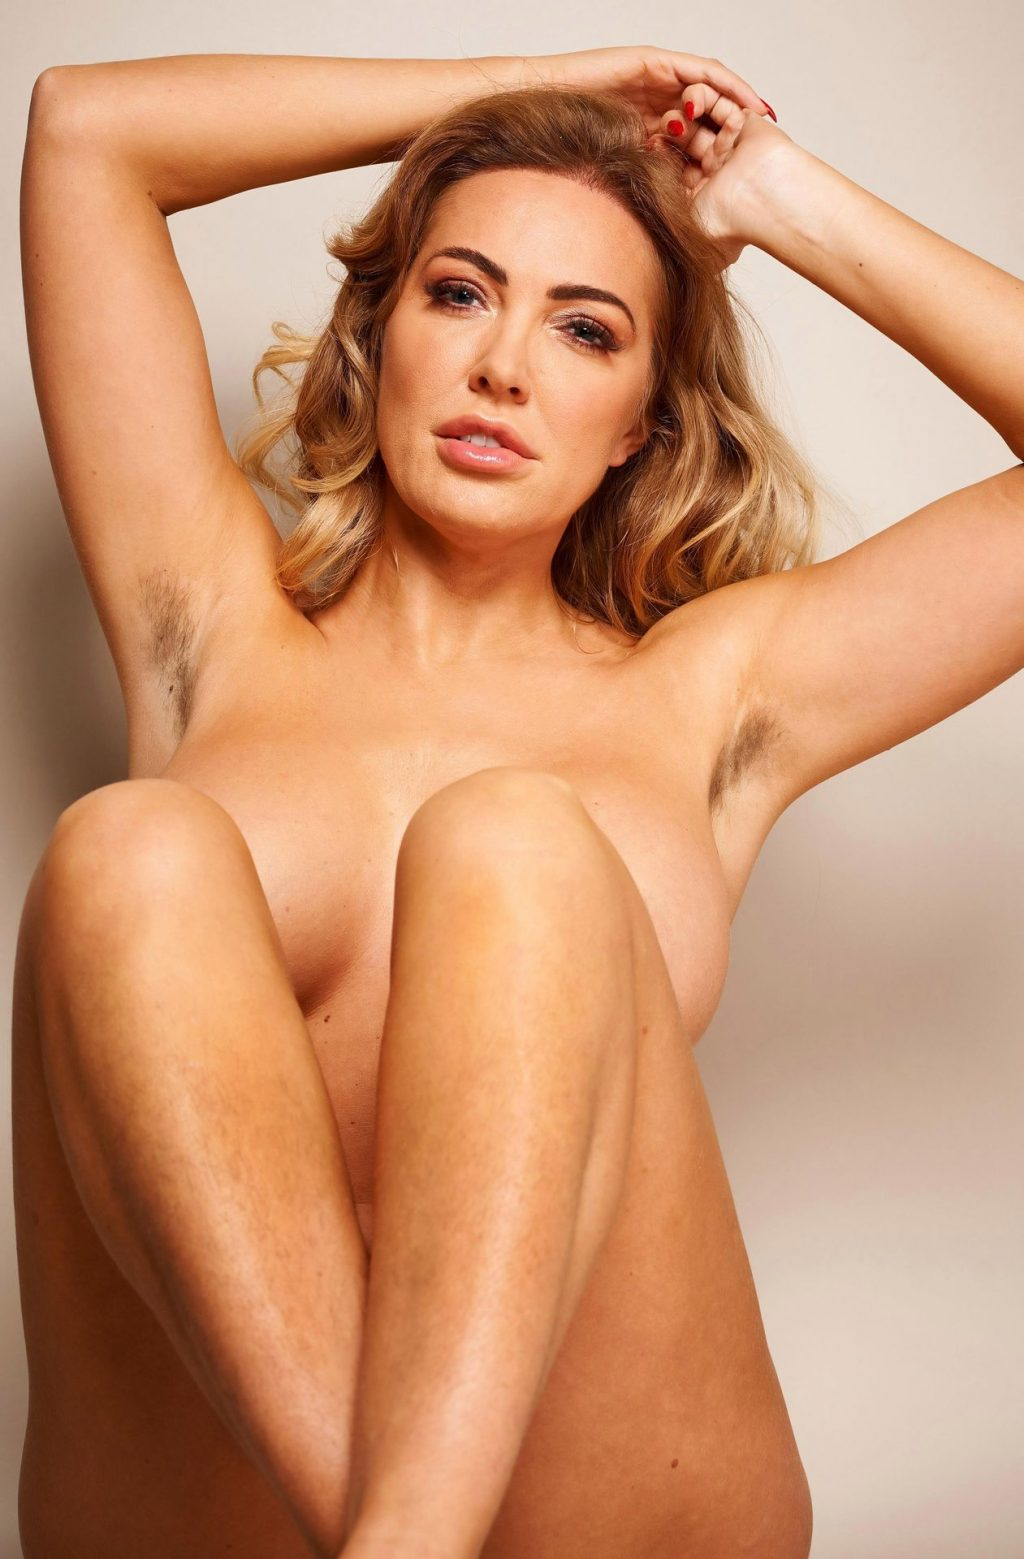 Alison Sweeney Topless aisleyne horgan-wallace nude (4 photos) – ( ͡° ͜ʖ ͡°)  the